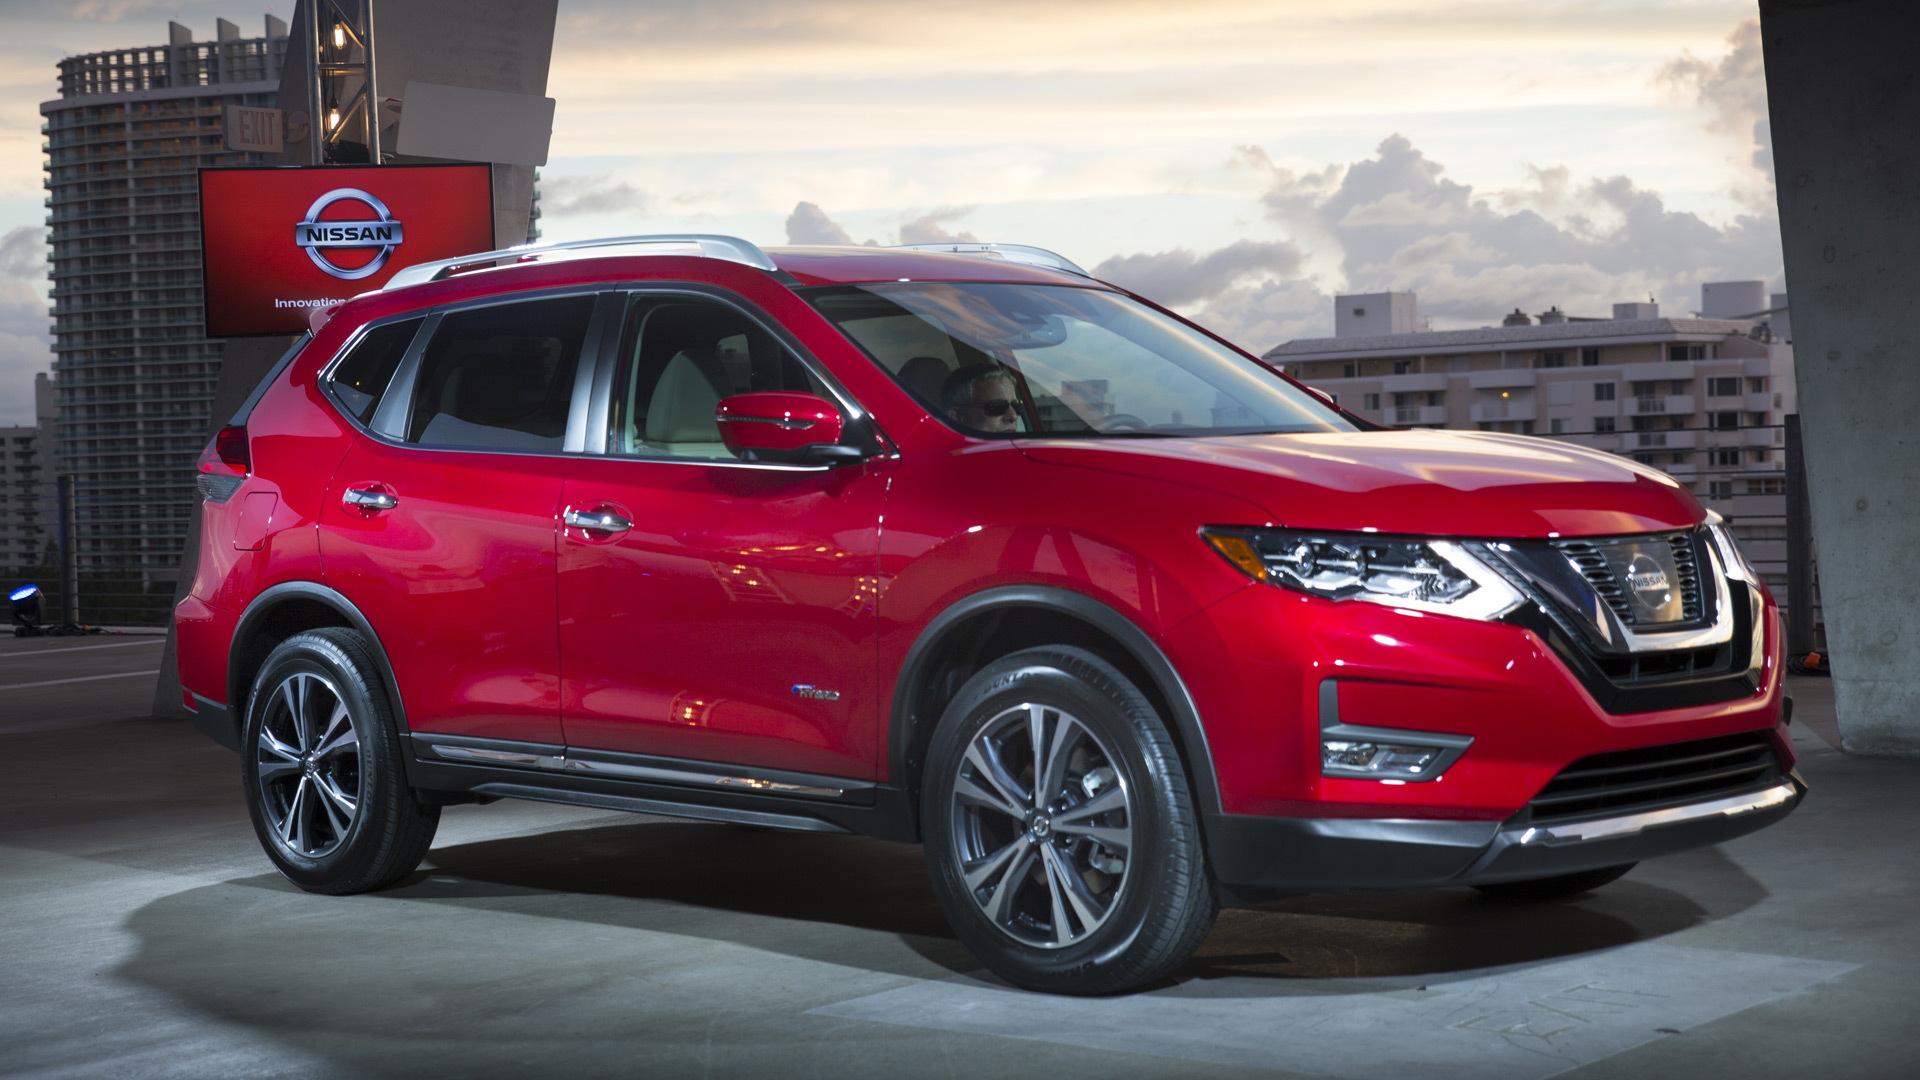 Nissan Hybrid Suv >> 2017 Nissan Rogue Hybrid Better Prospects Than Pathfinder